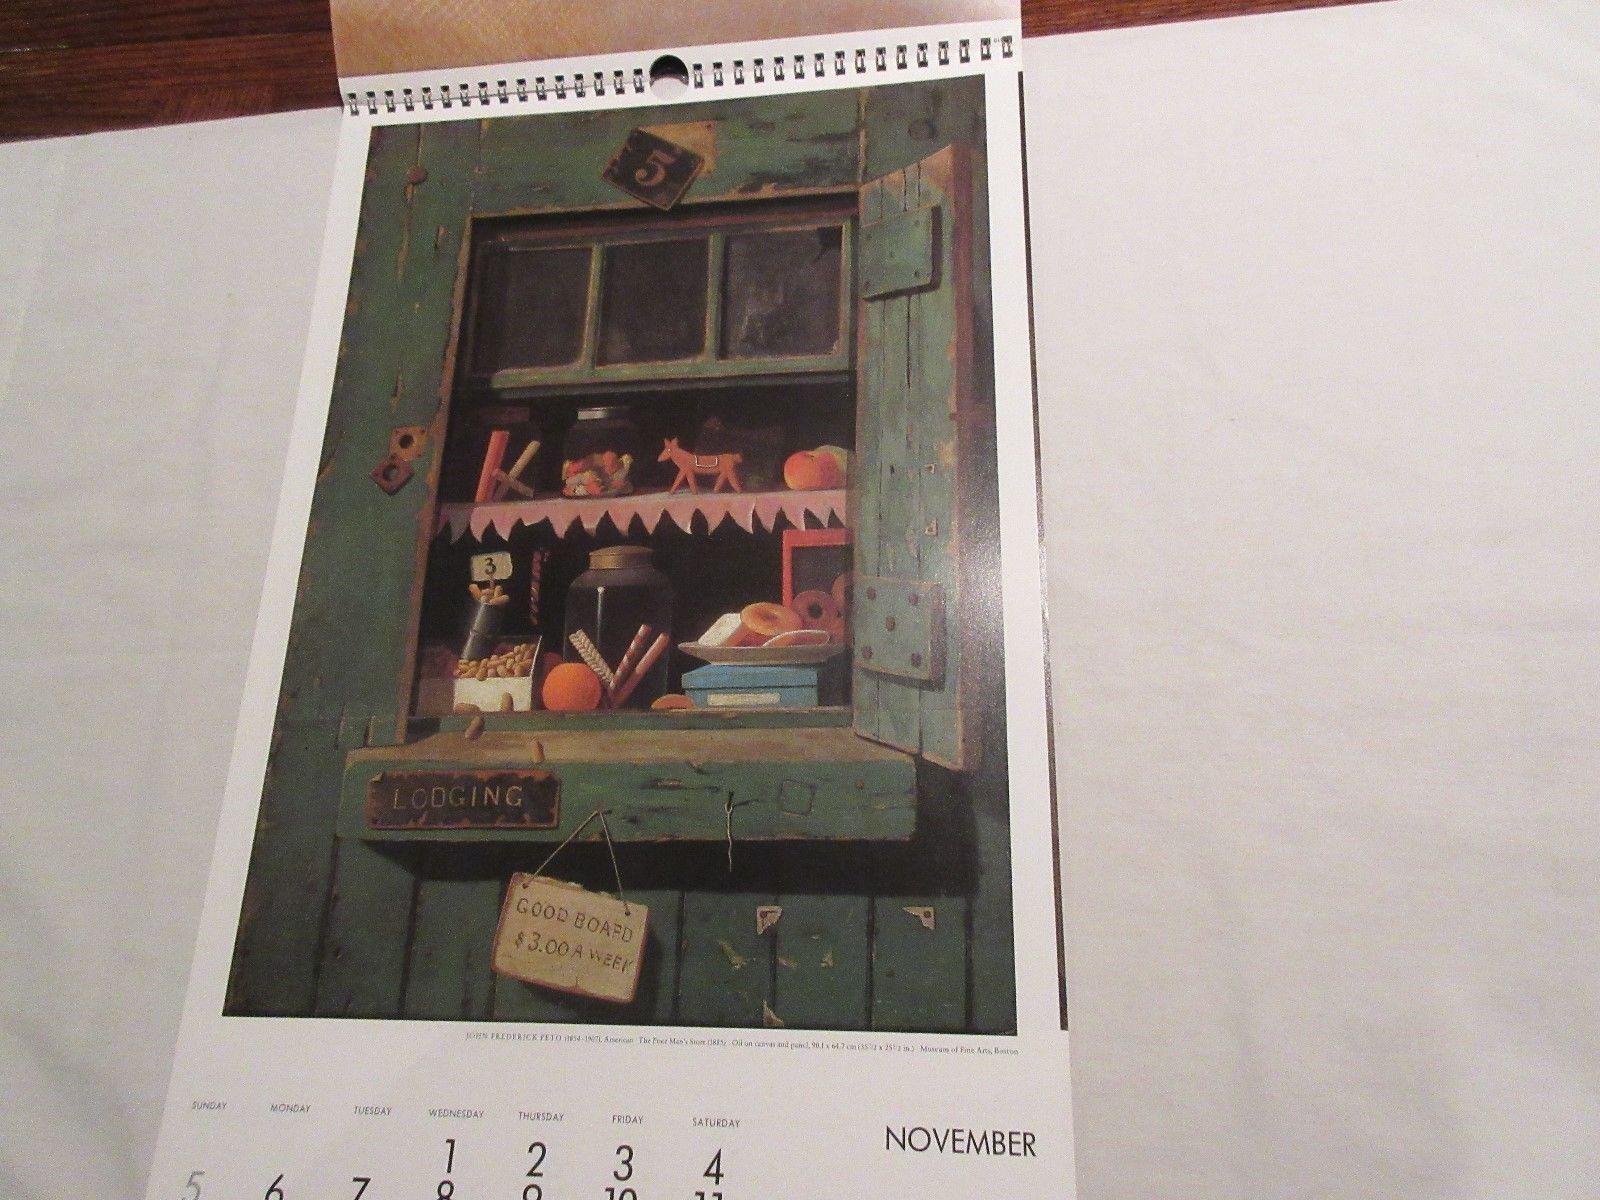 Rx , Pharmacy , Calendar , Hoechst-Roussel Pharmaceuticals Inc.,1989 , Vintage image 6